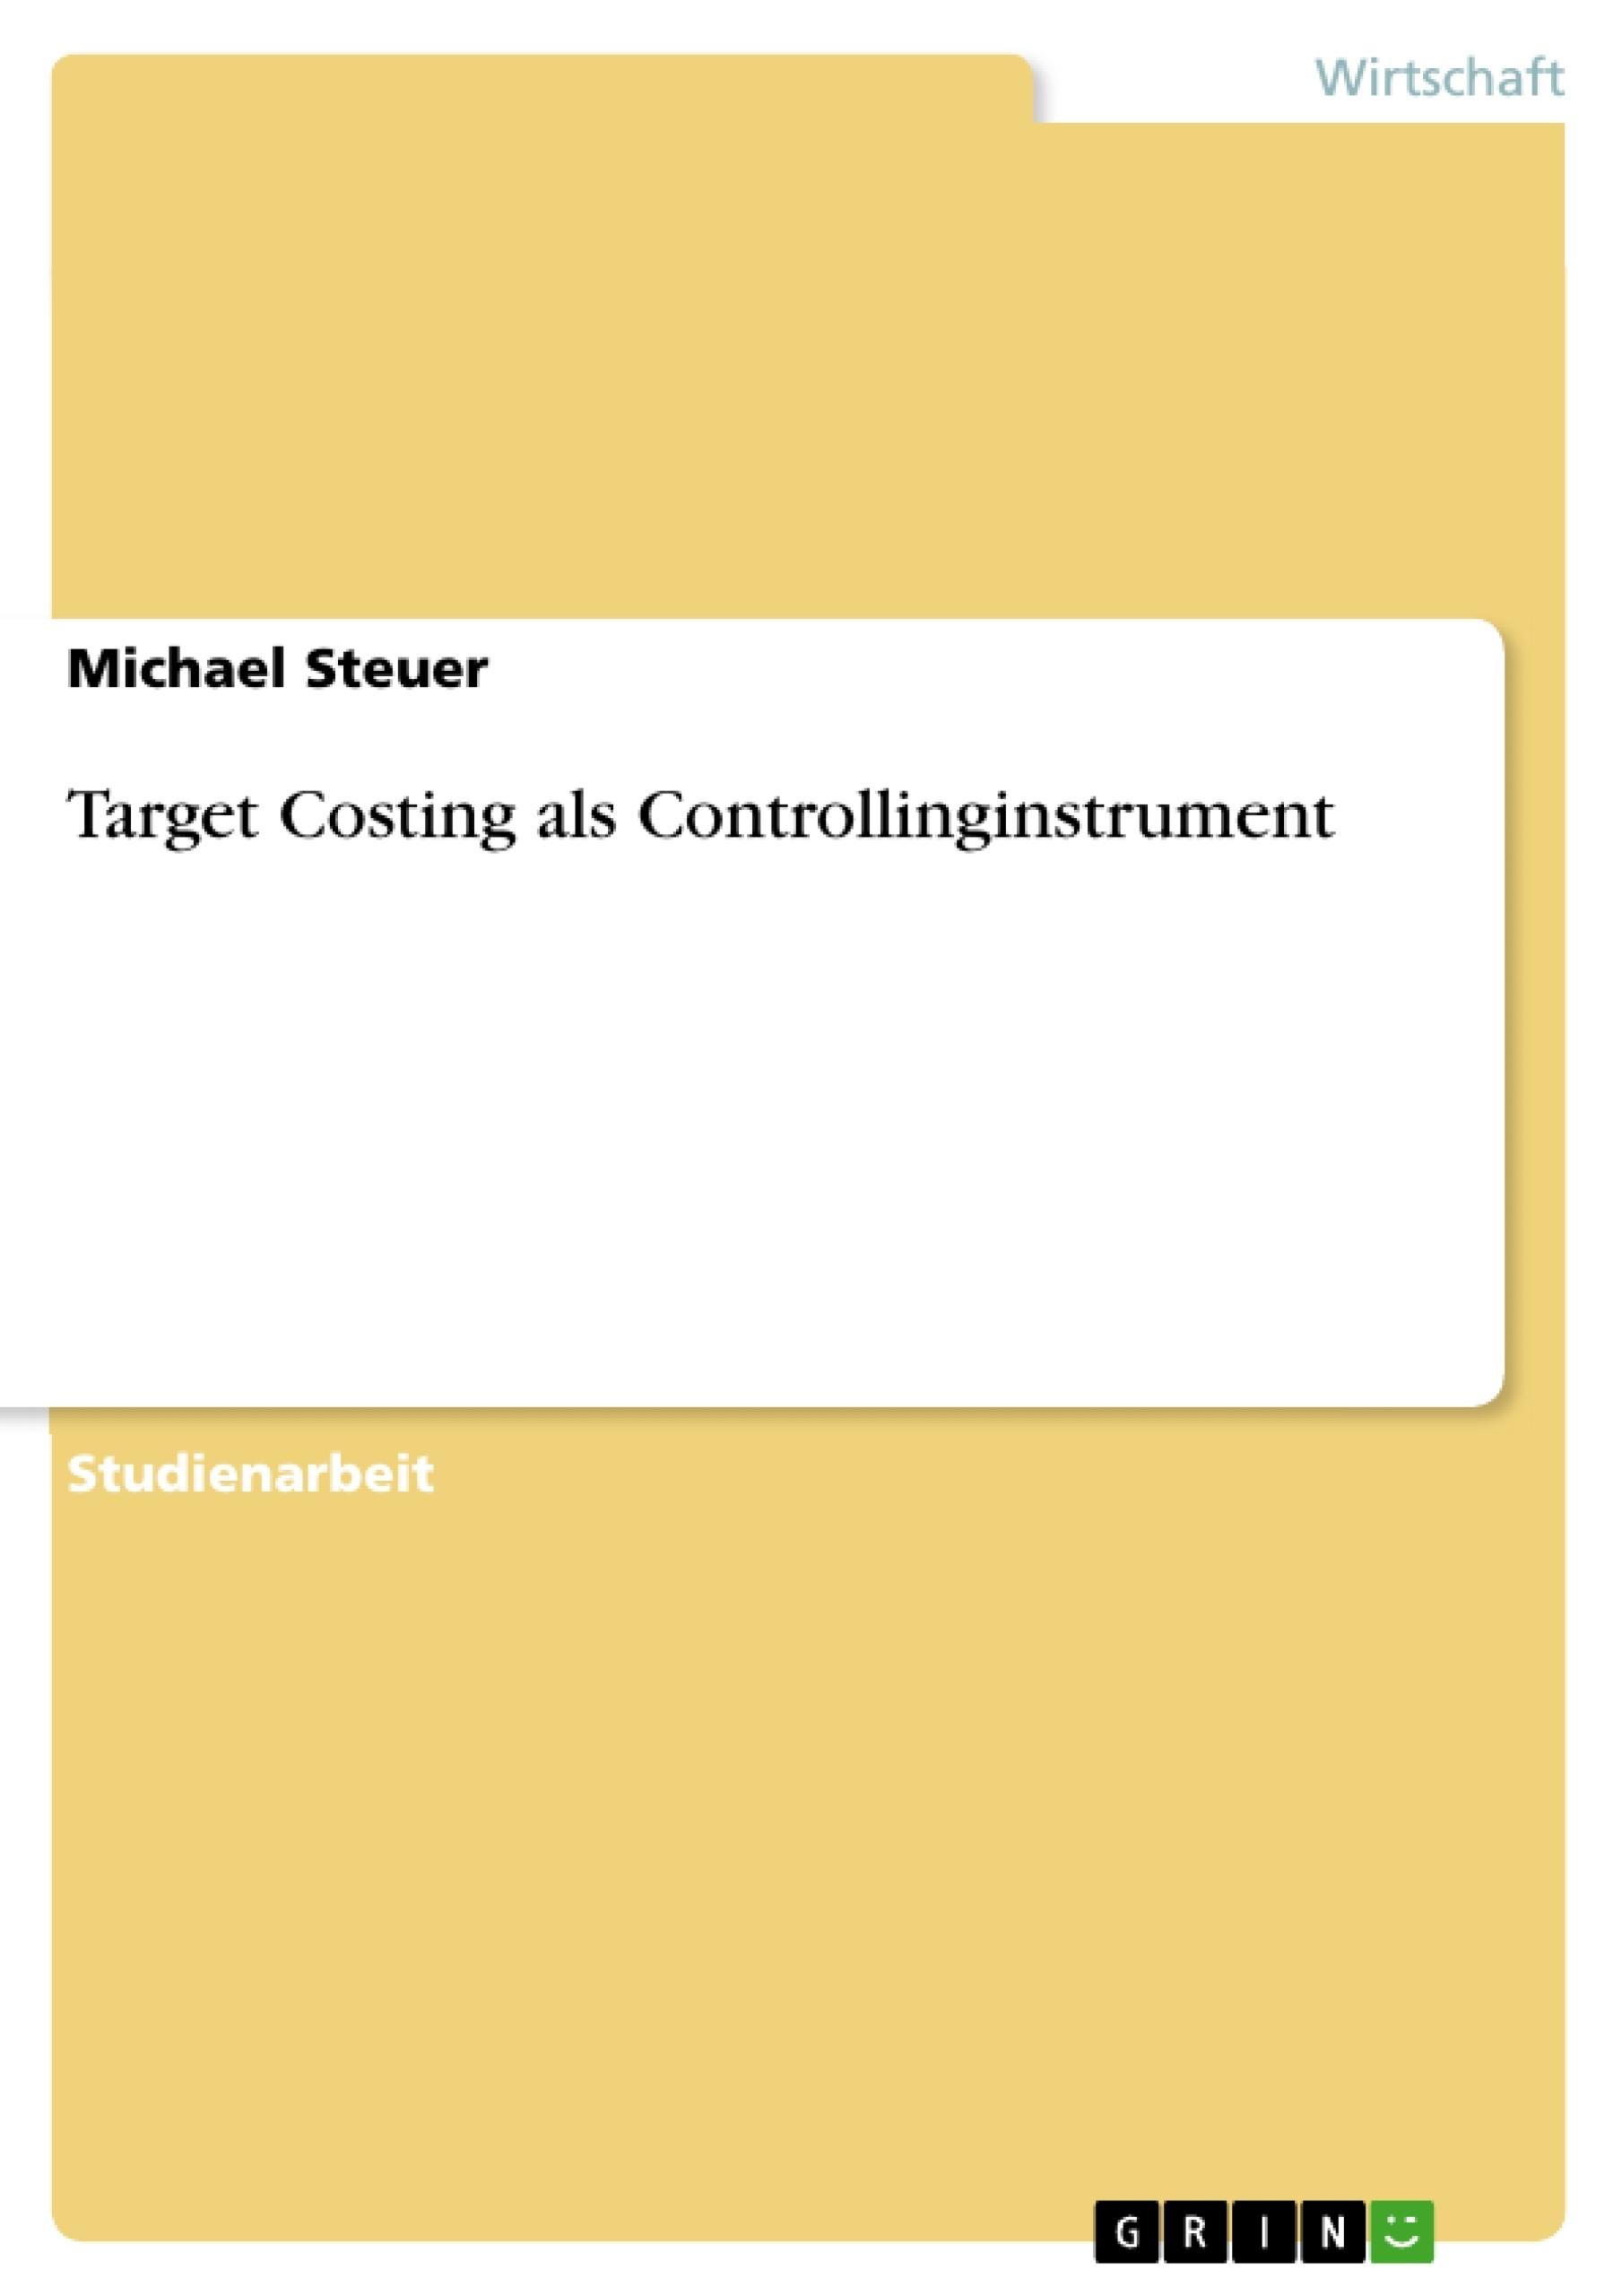 Titel: Target Costing als Controllinginstrument